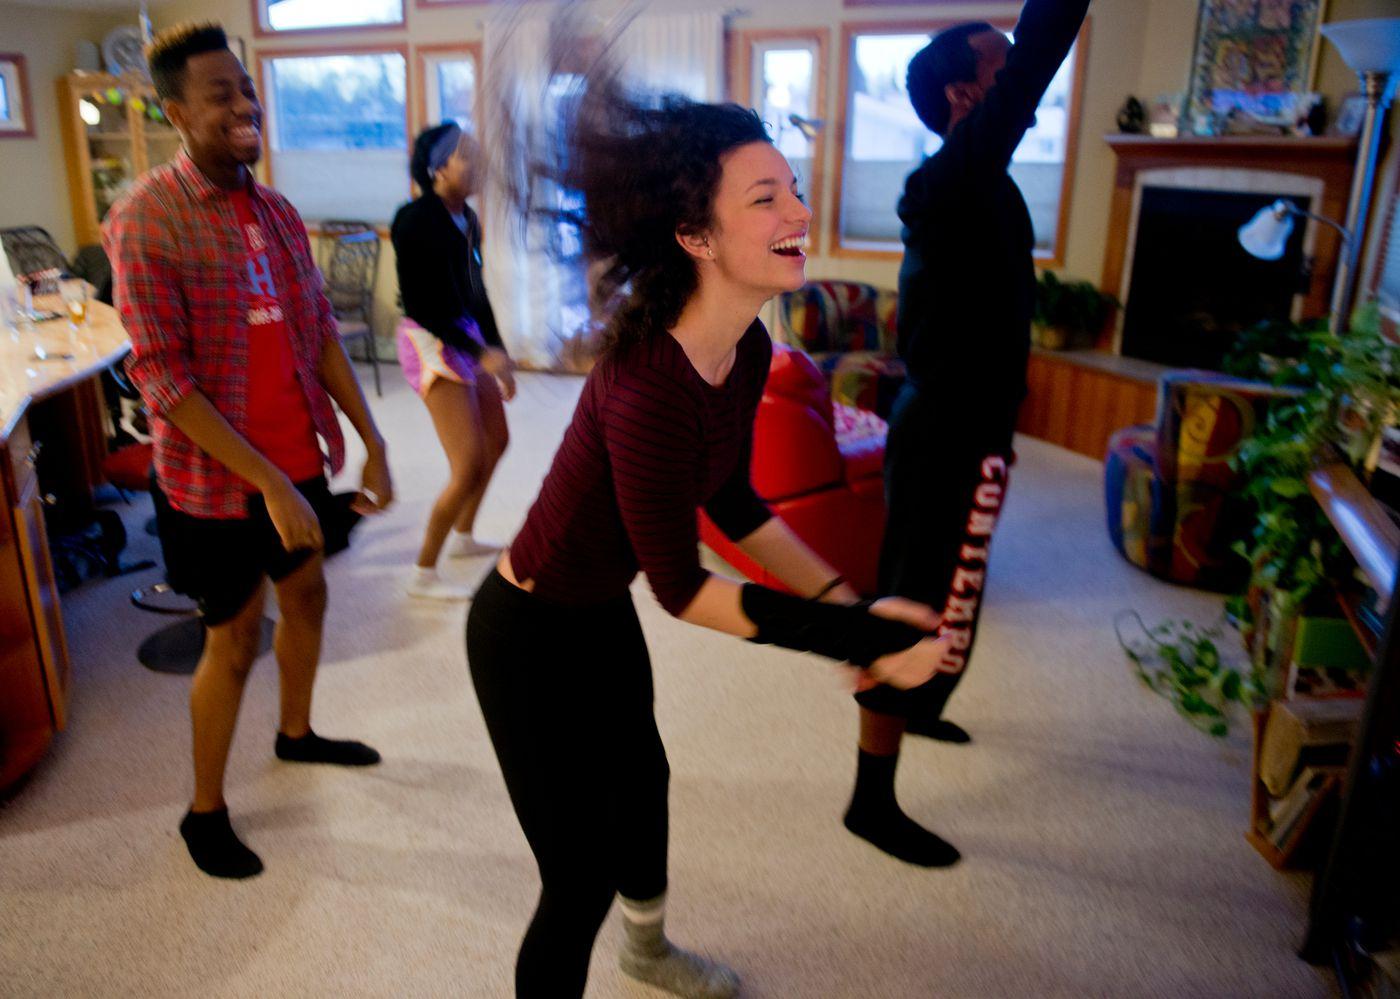 Taylor Haines dances in her living room with friends Anthoney Squalls, Destiny Grant and V.J. Vea on Thursday, November 12, 2015.